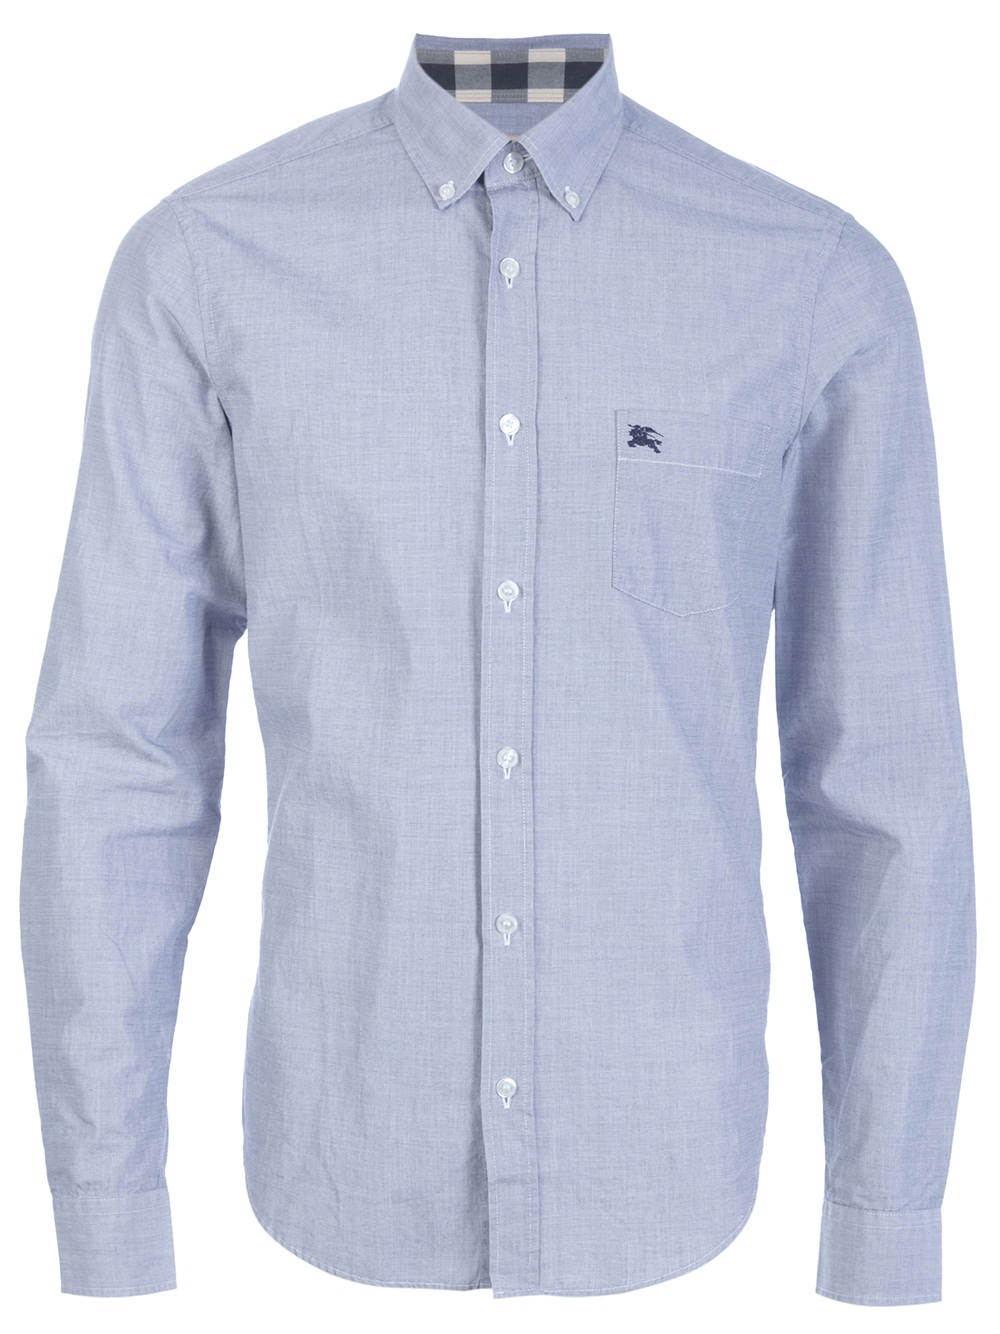 7e79d9c6 Men's Burberry Button Down Dress Shirt   The Art of Mike Mignola